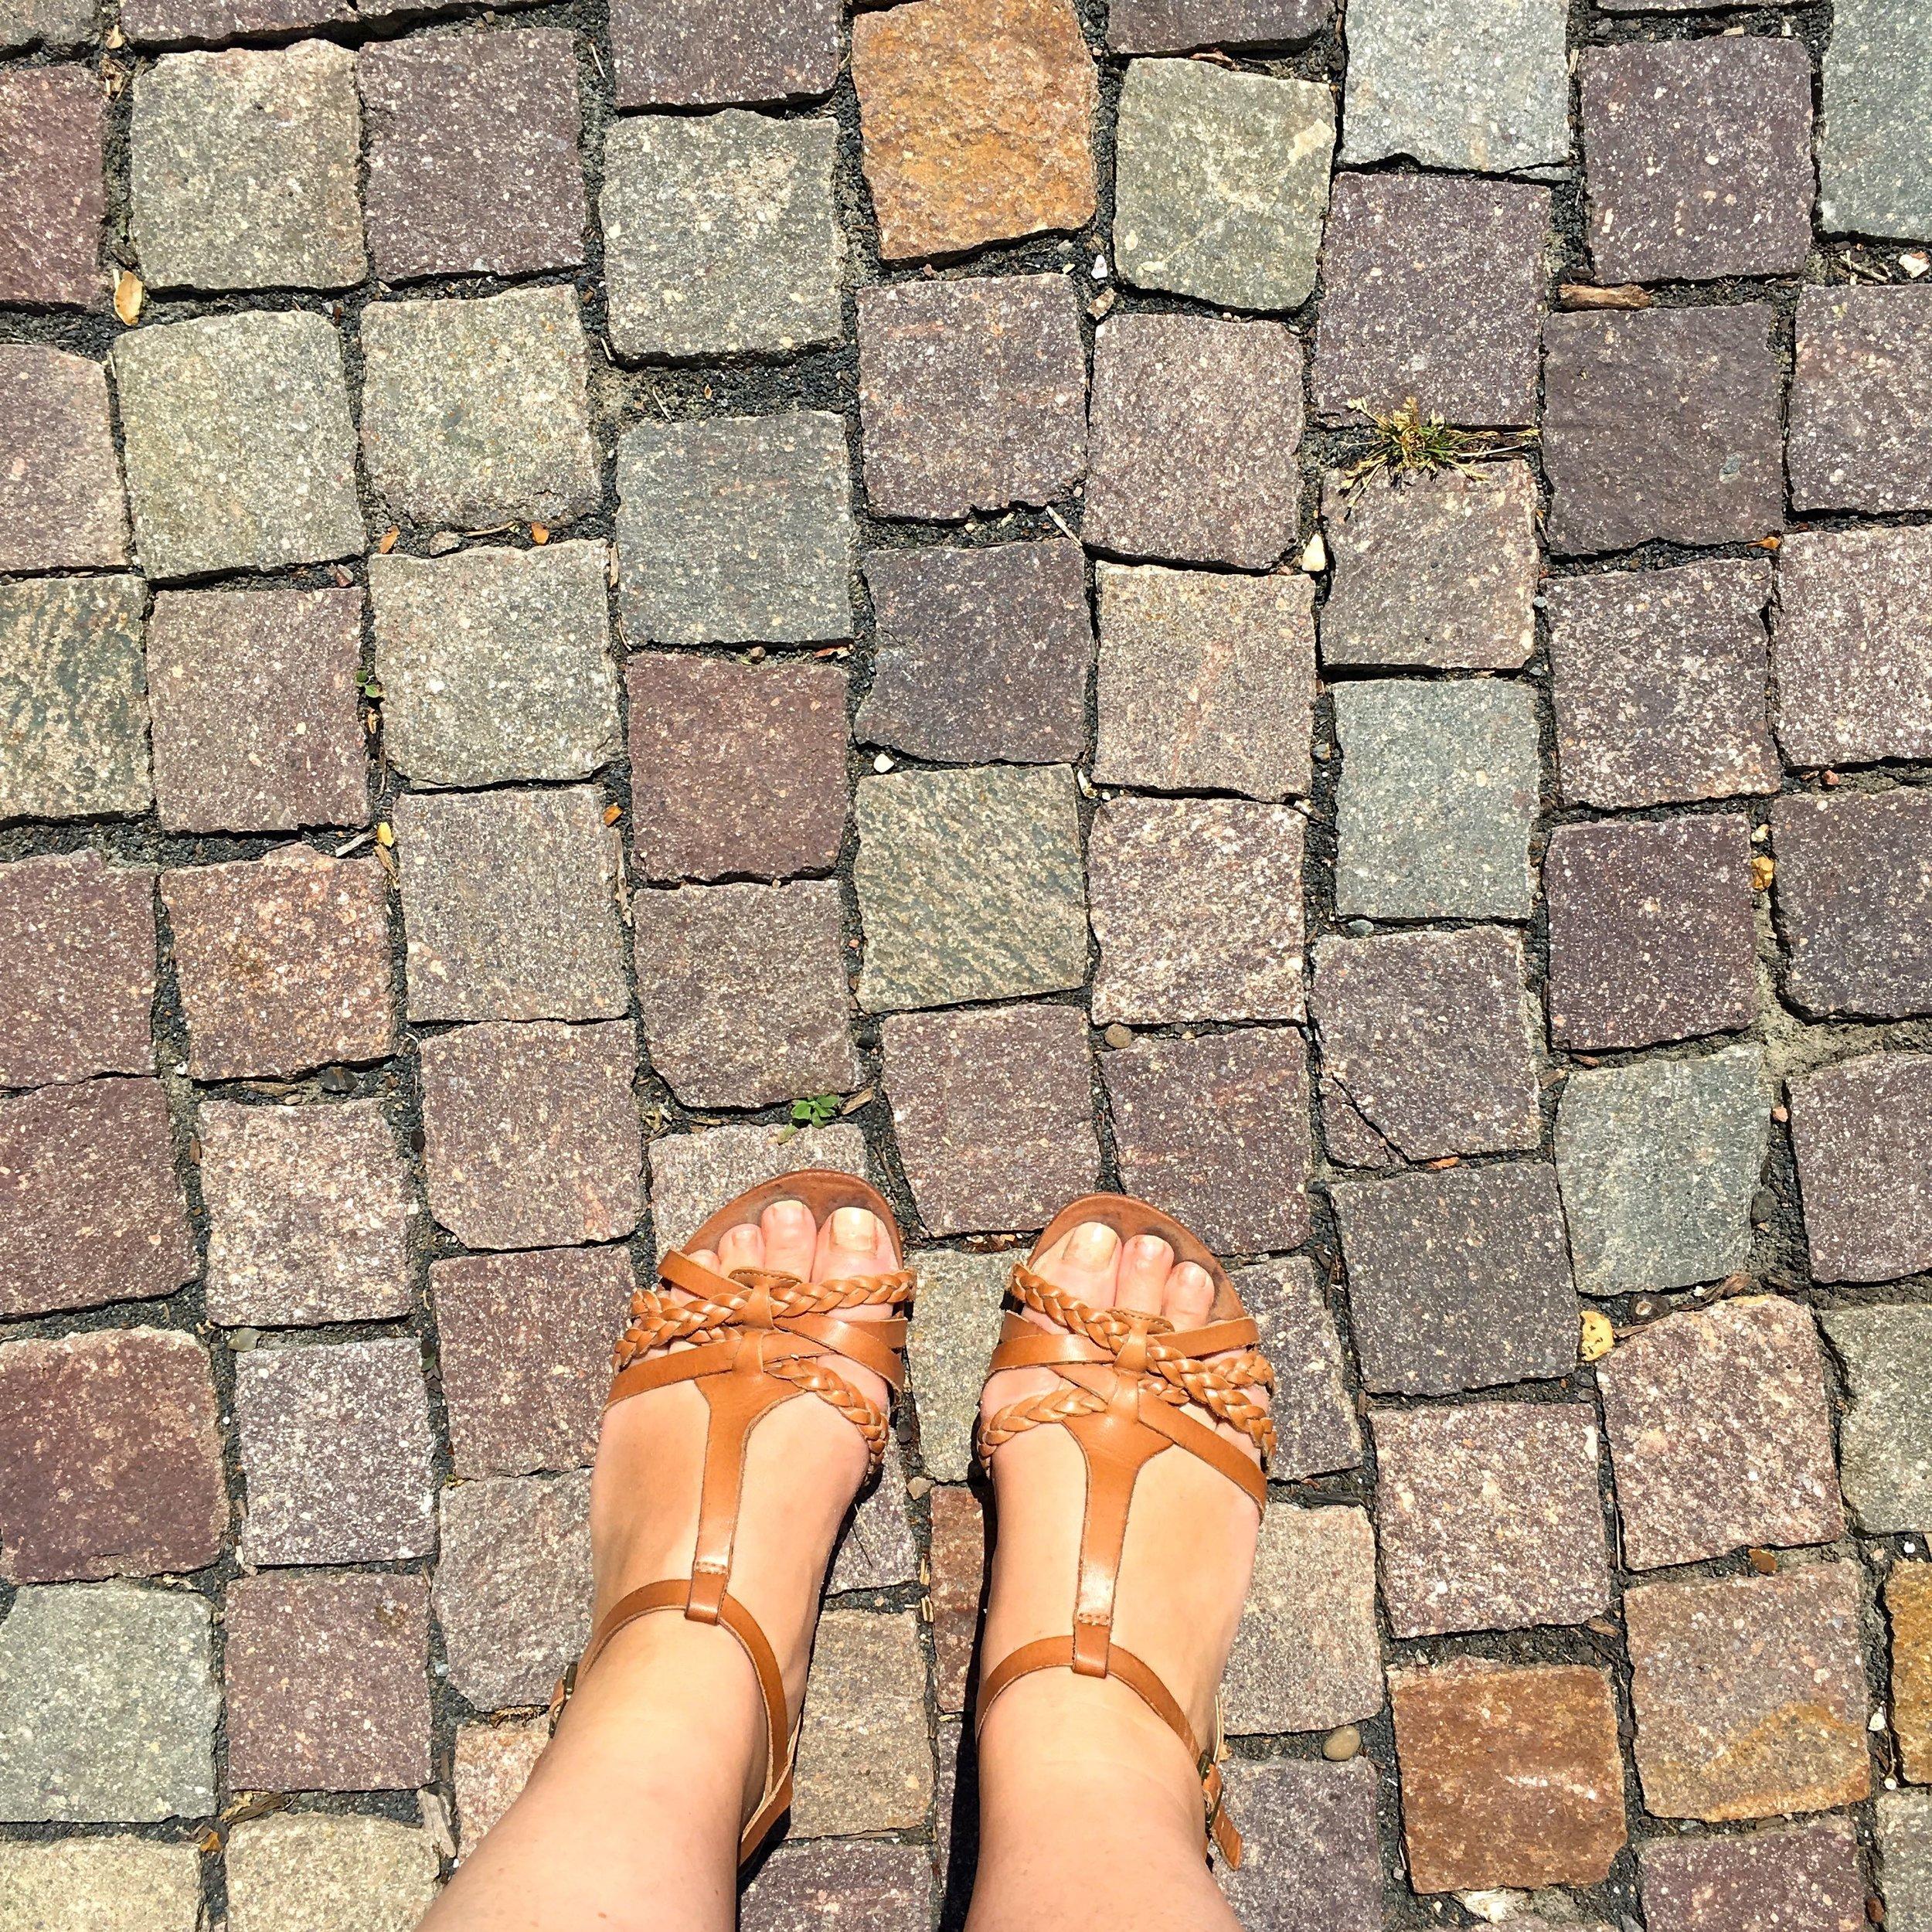 hot feet in the vegetable garden